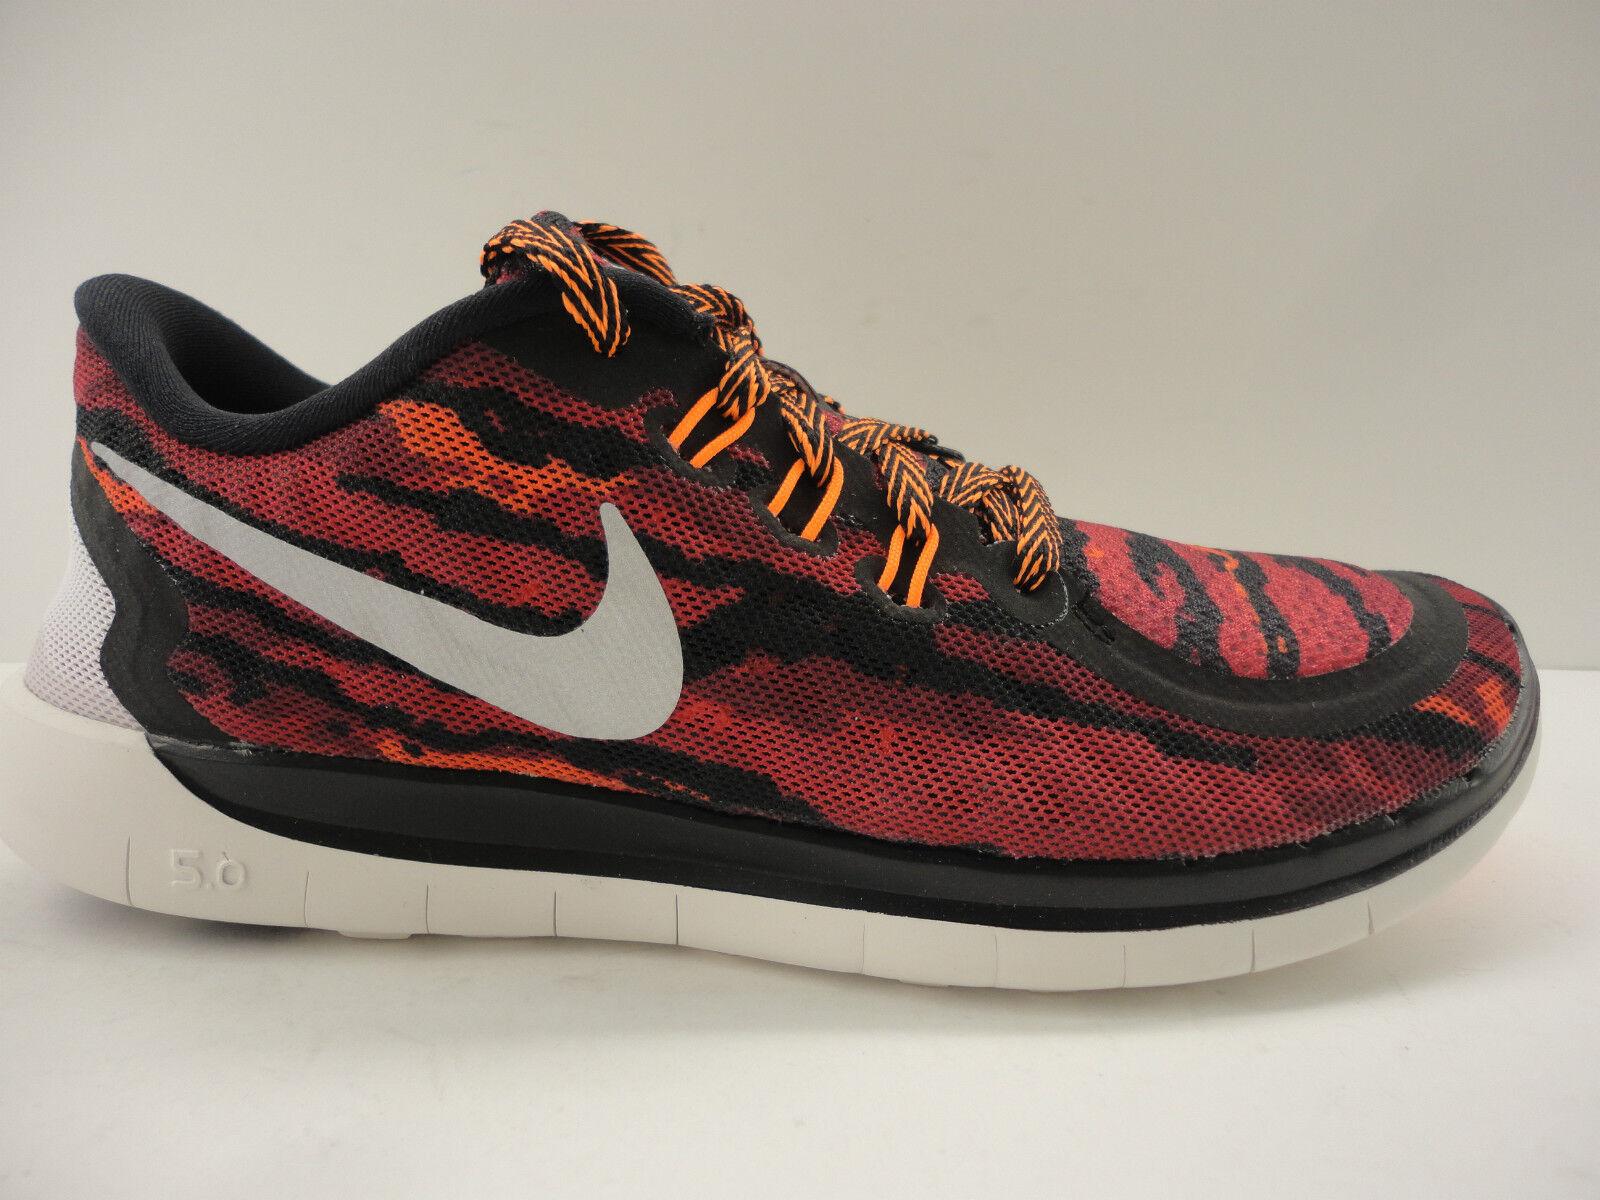 3bfc6394b55ef Nike Free 5.0 Rosherun Print GS 749681 001 Rosherun 5.0 Chaussures Femmes  af79bb